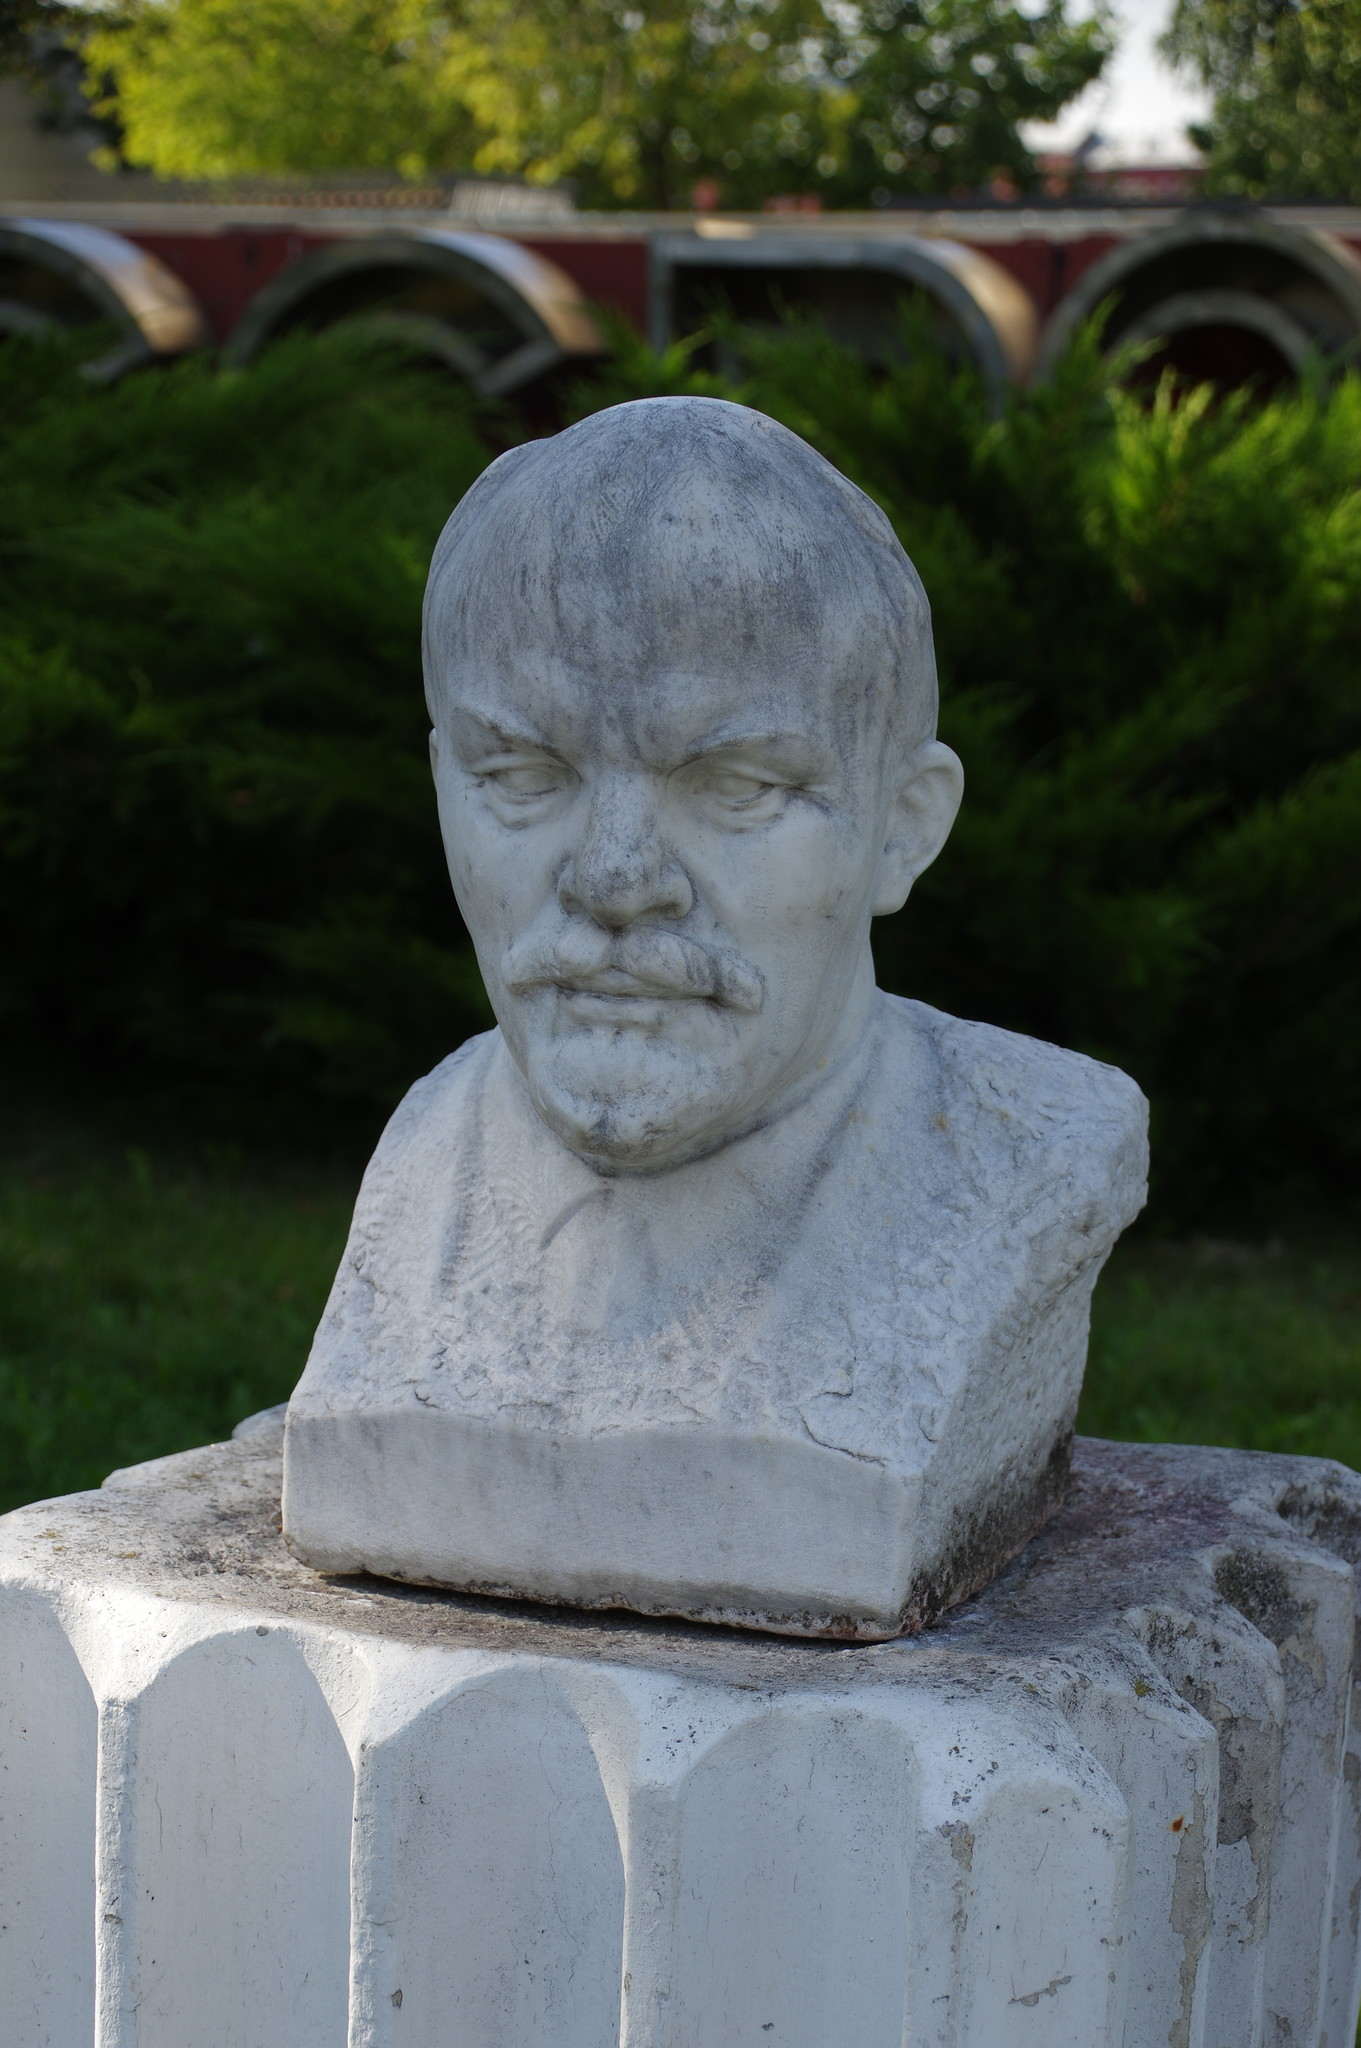 Портрет В.И. Ленина. Виленский З.М. 1982 г. Мрамор. Парк искусств «Музеон»